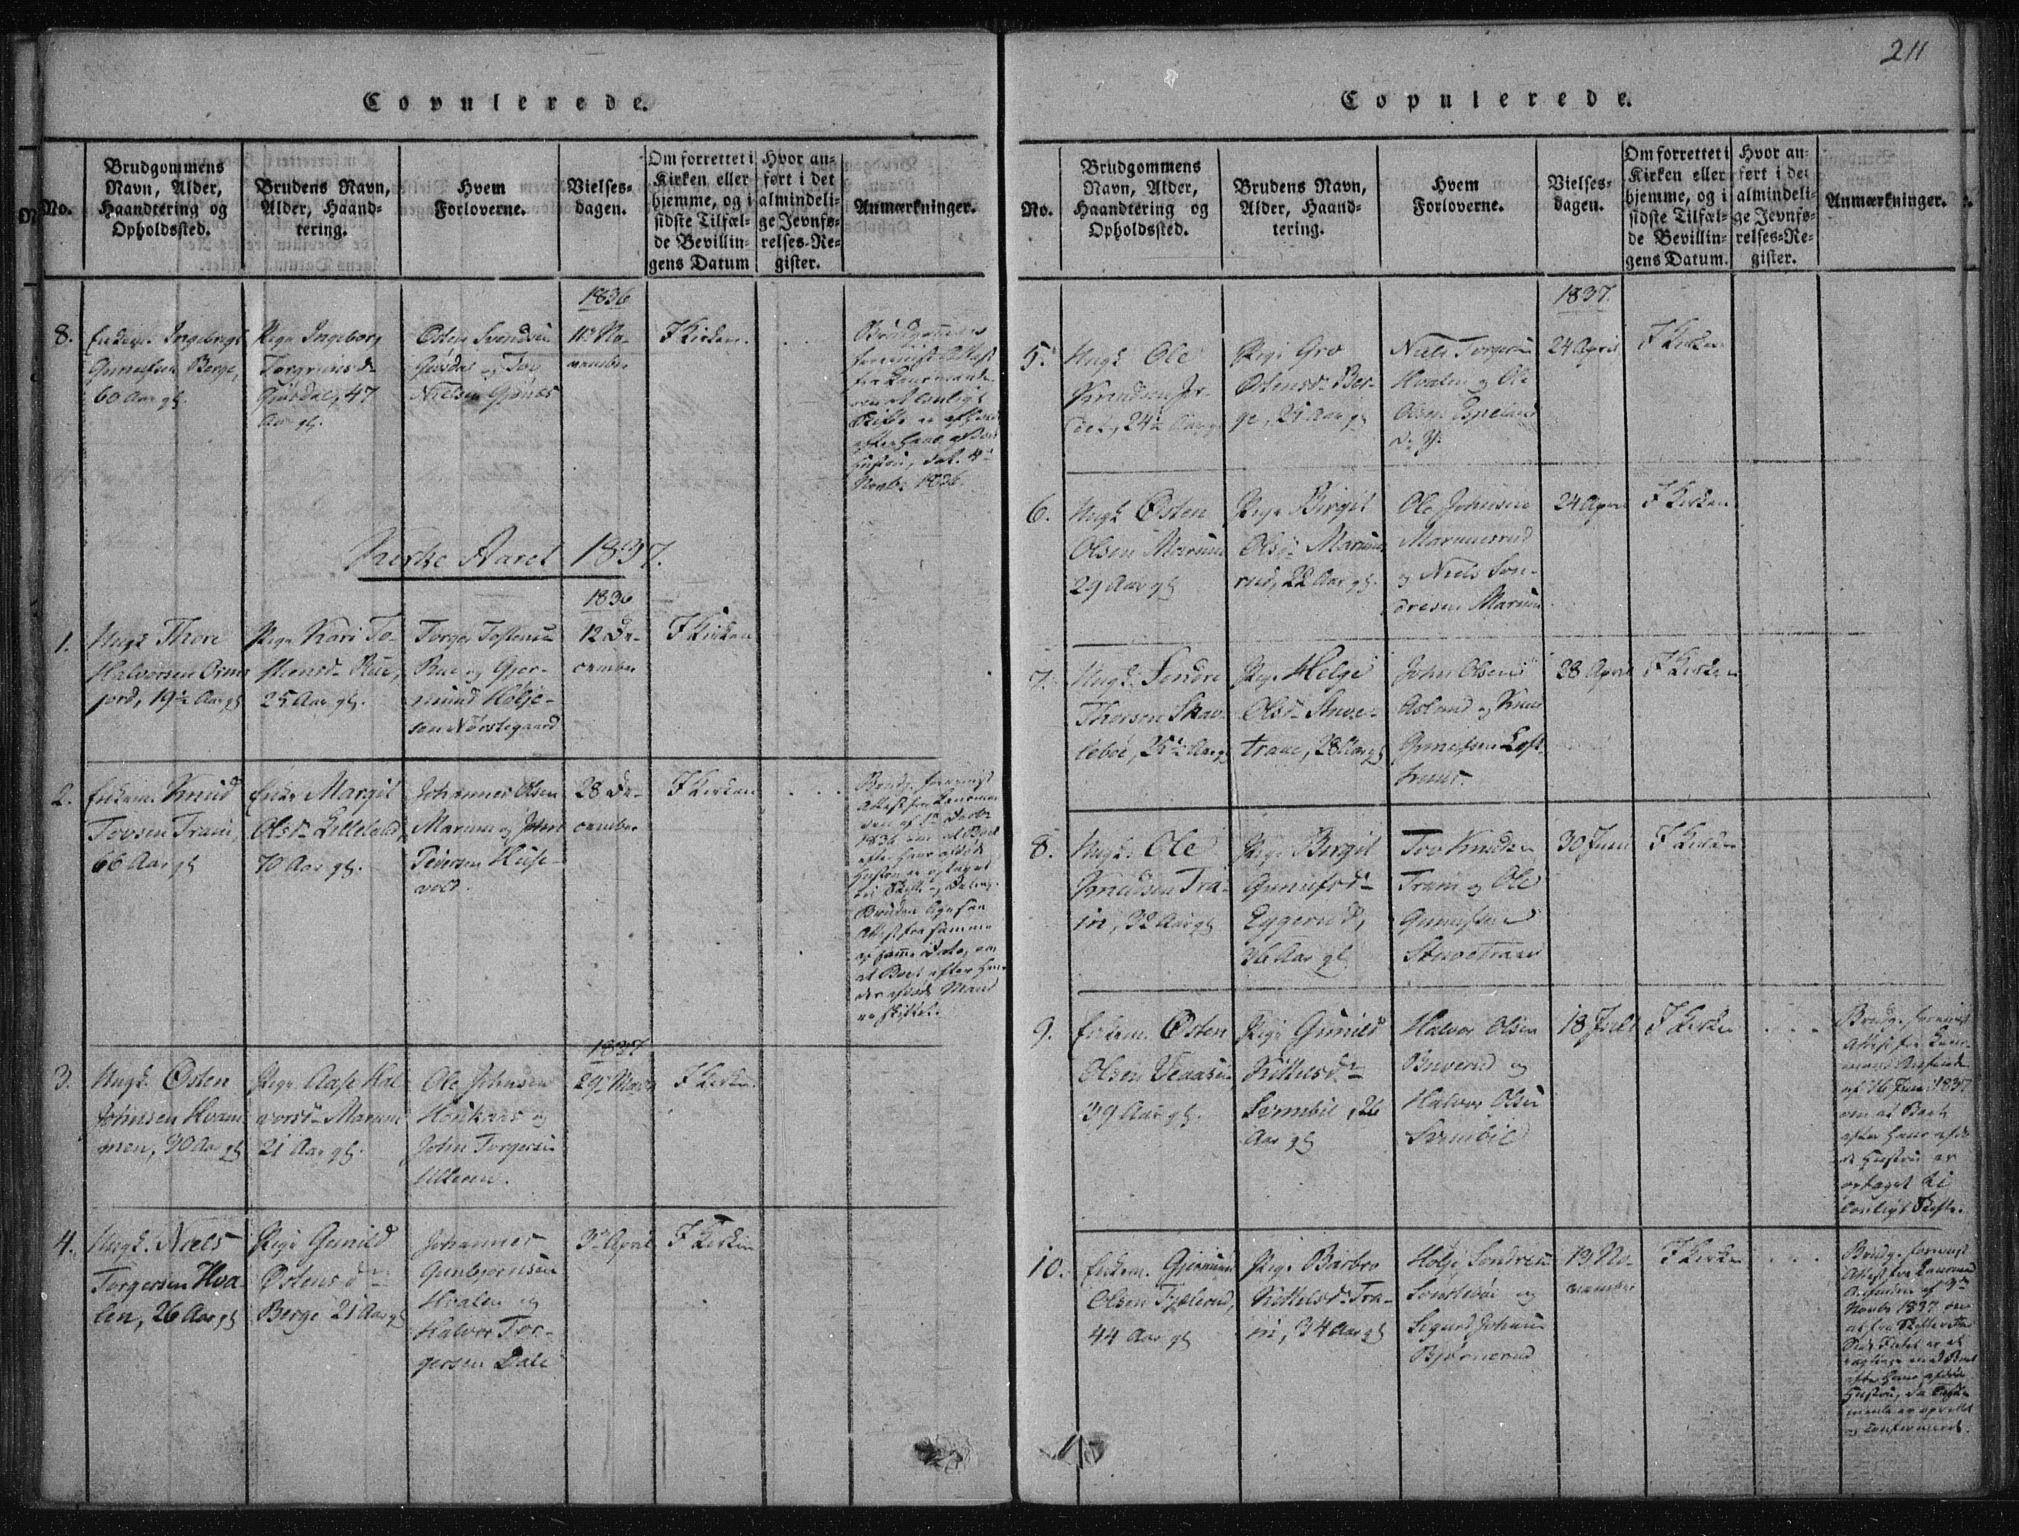 SAKO, Tinn kirkebøker, F/Fa/L0004: Ministerialbok nr. I 4, 1815-1843, s. 211